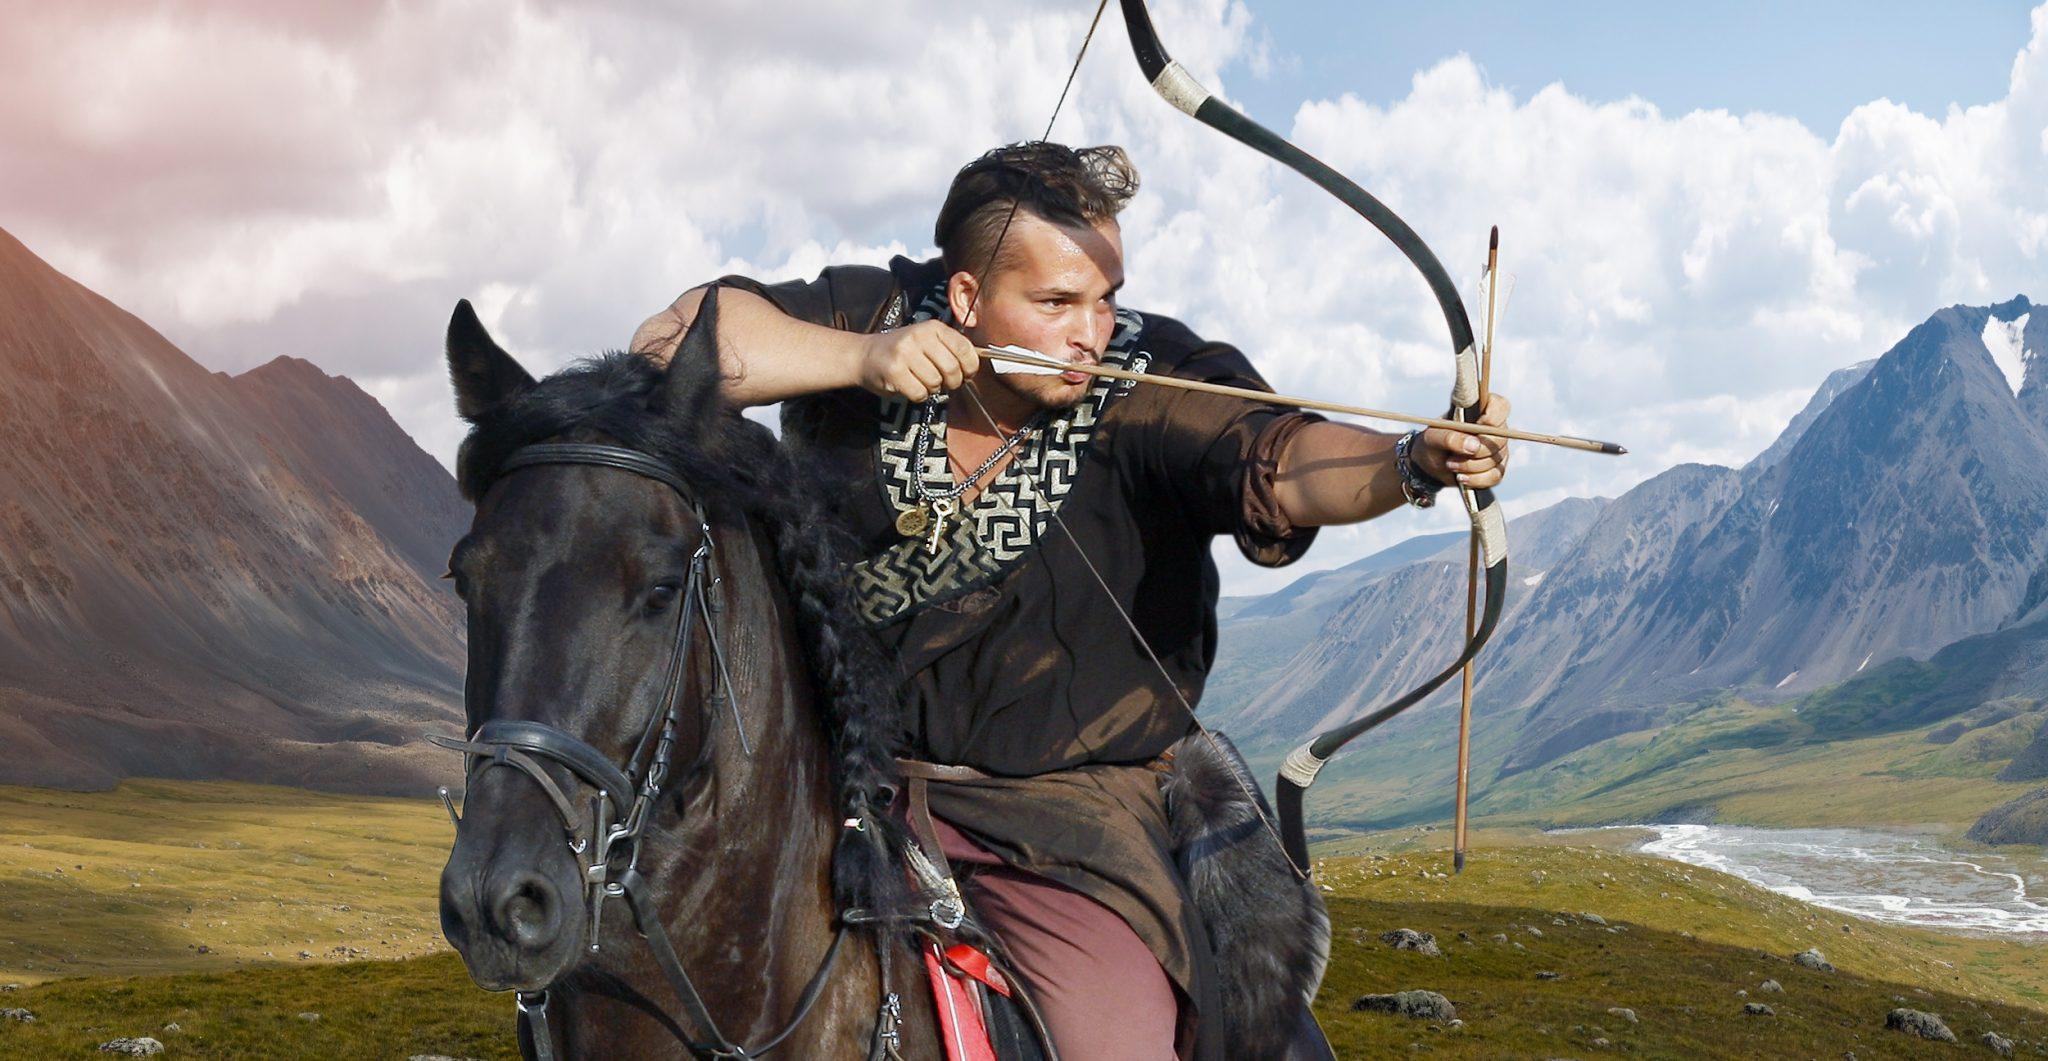 Bowman on horseback of the ancient world.